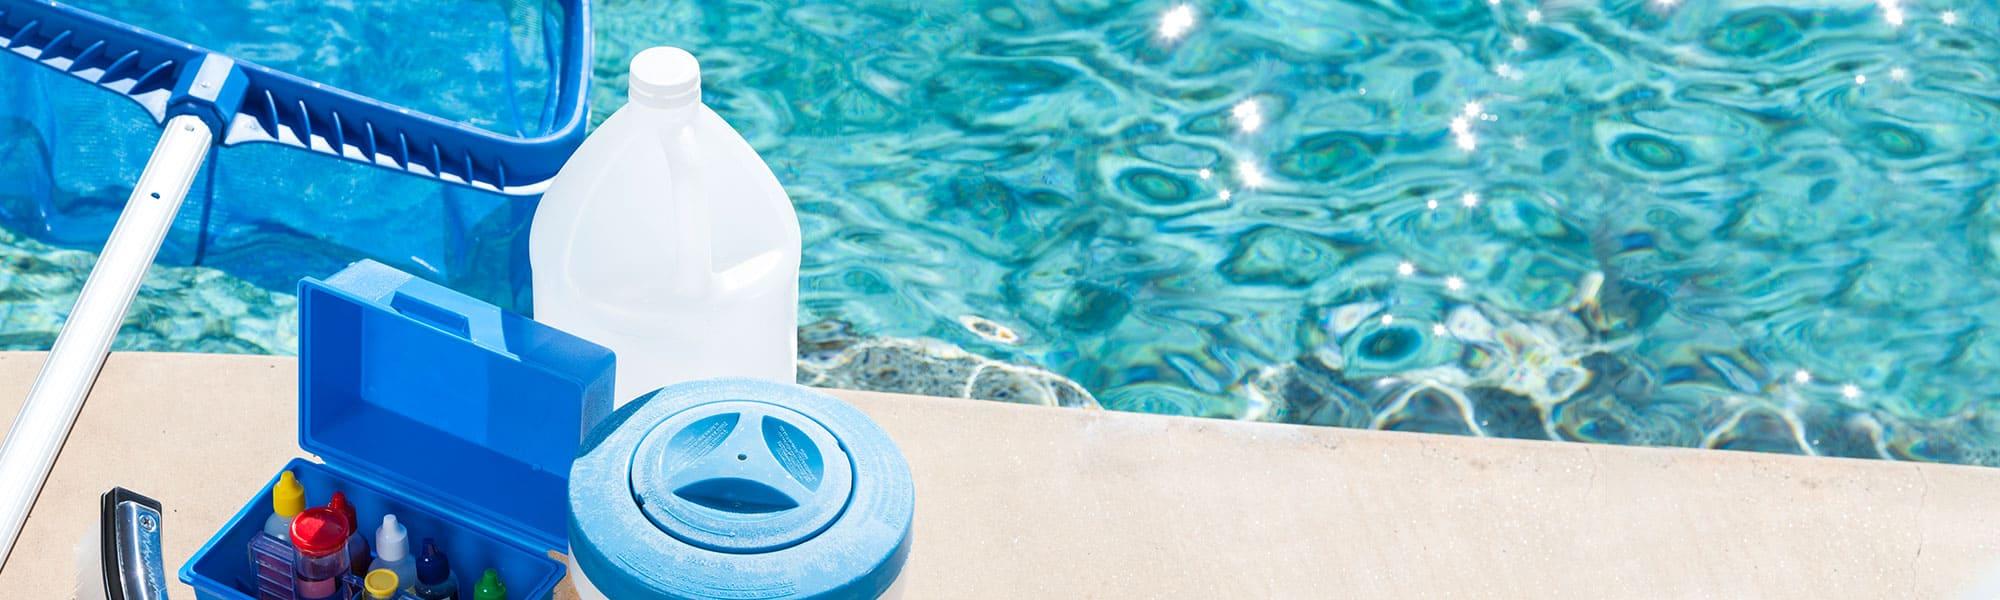 nettoyer une piscine